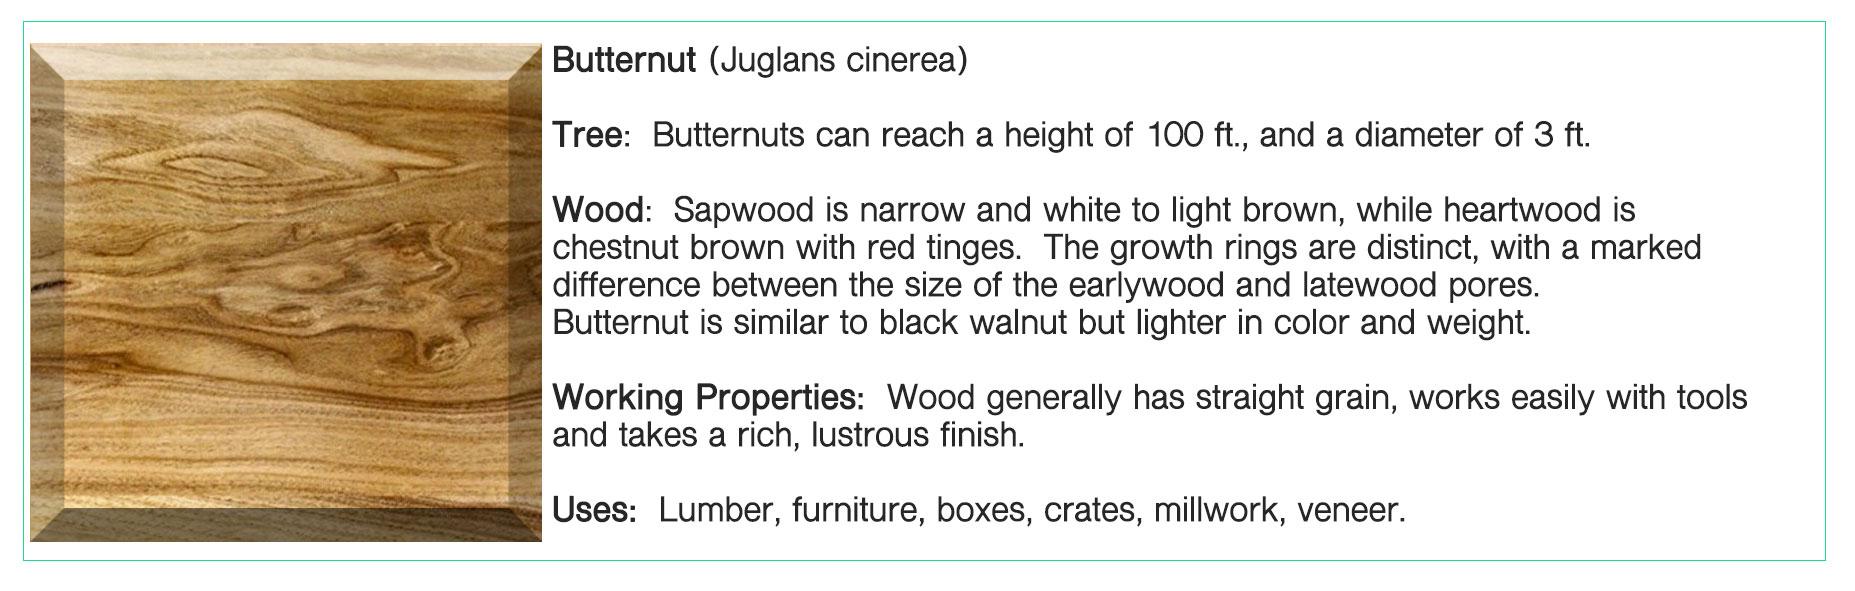 Butternut.jpg